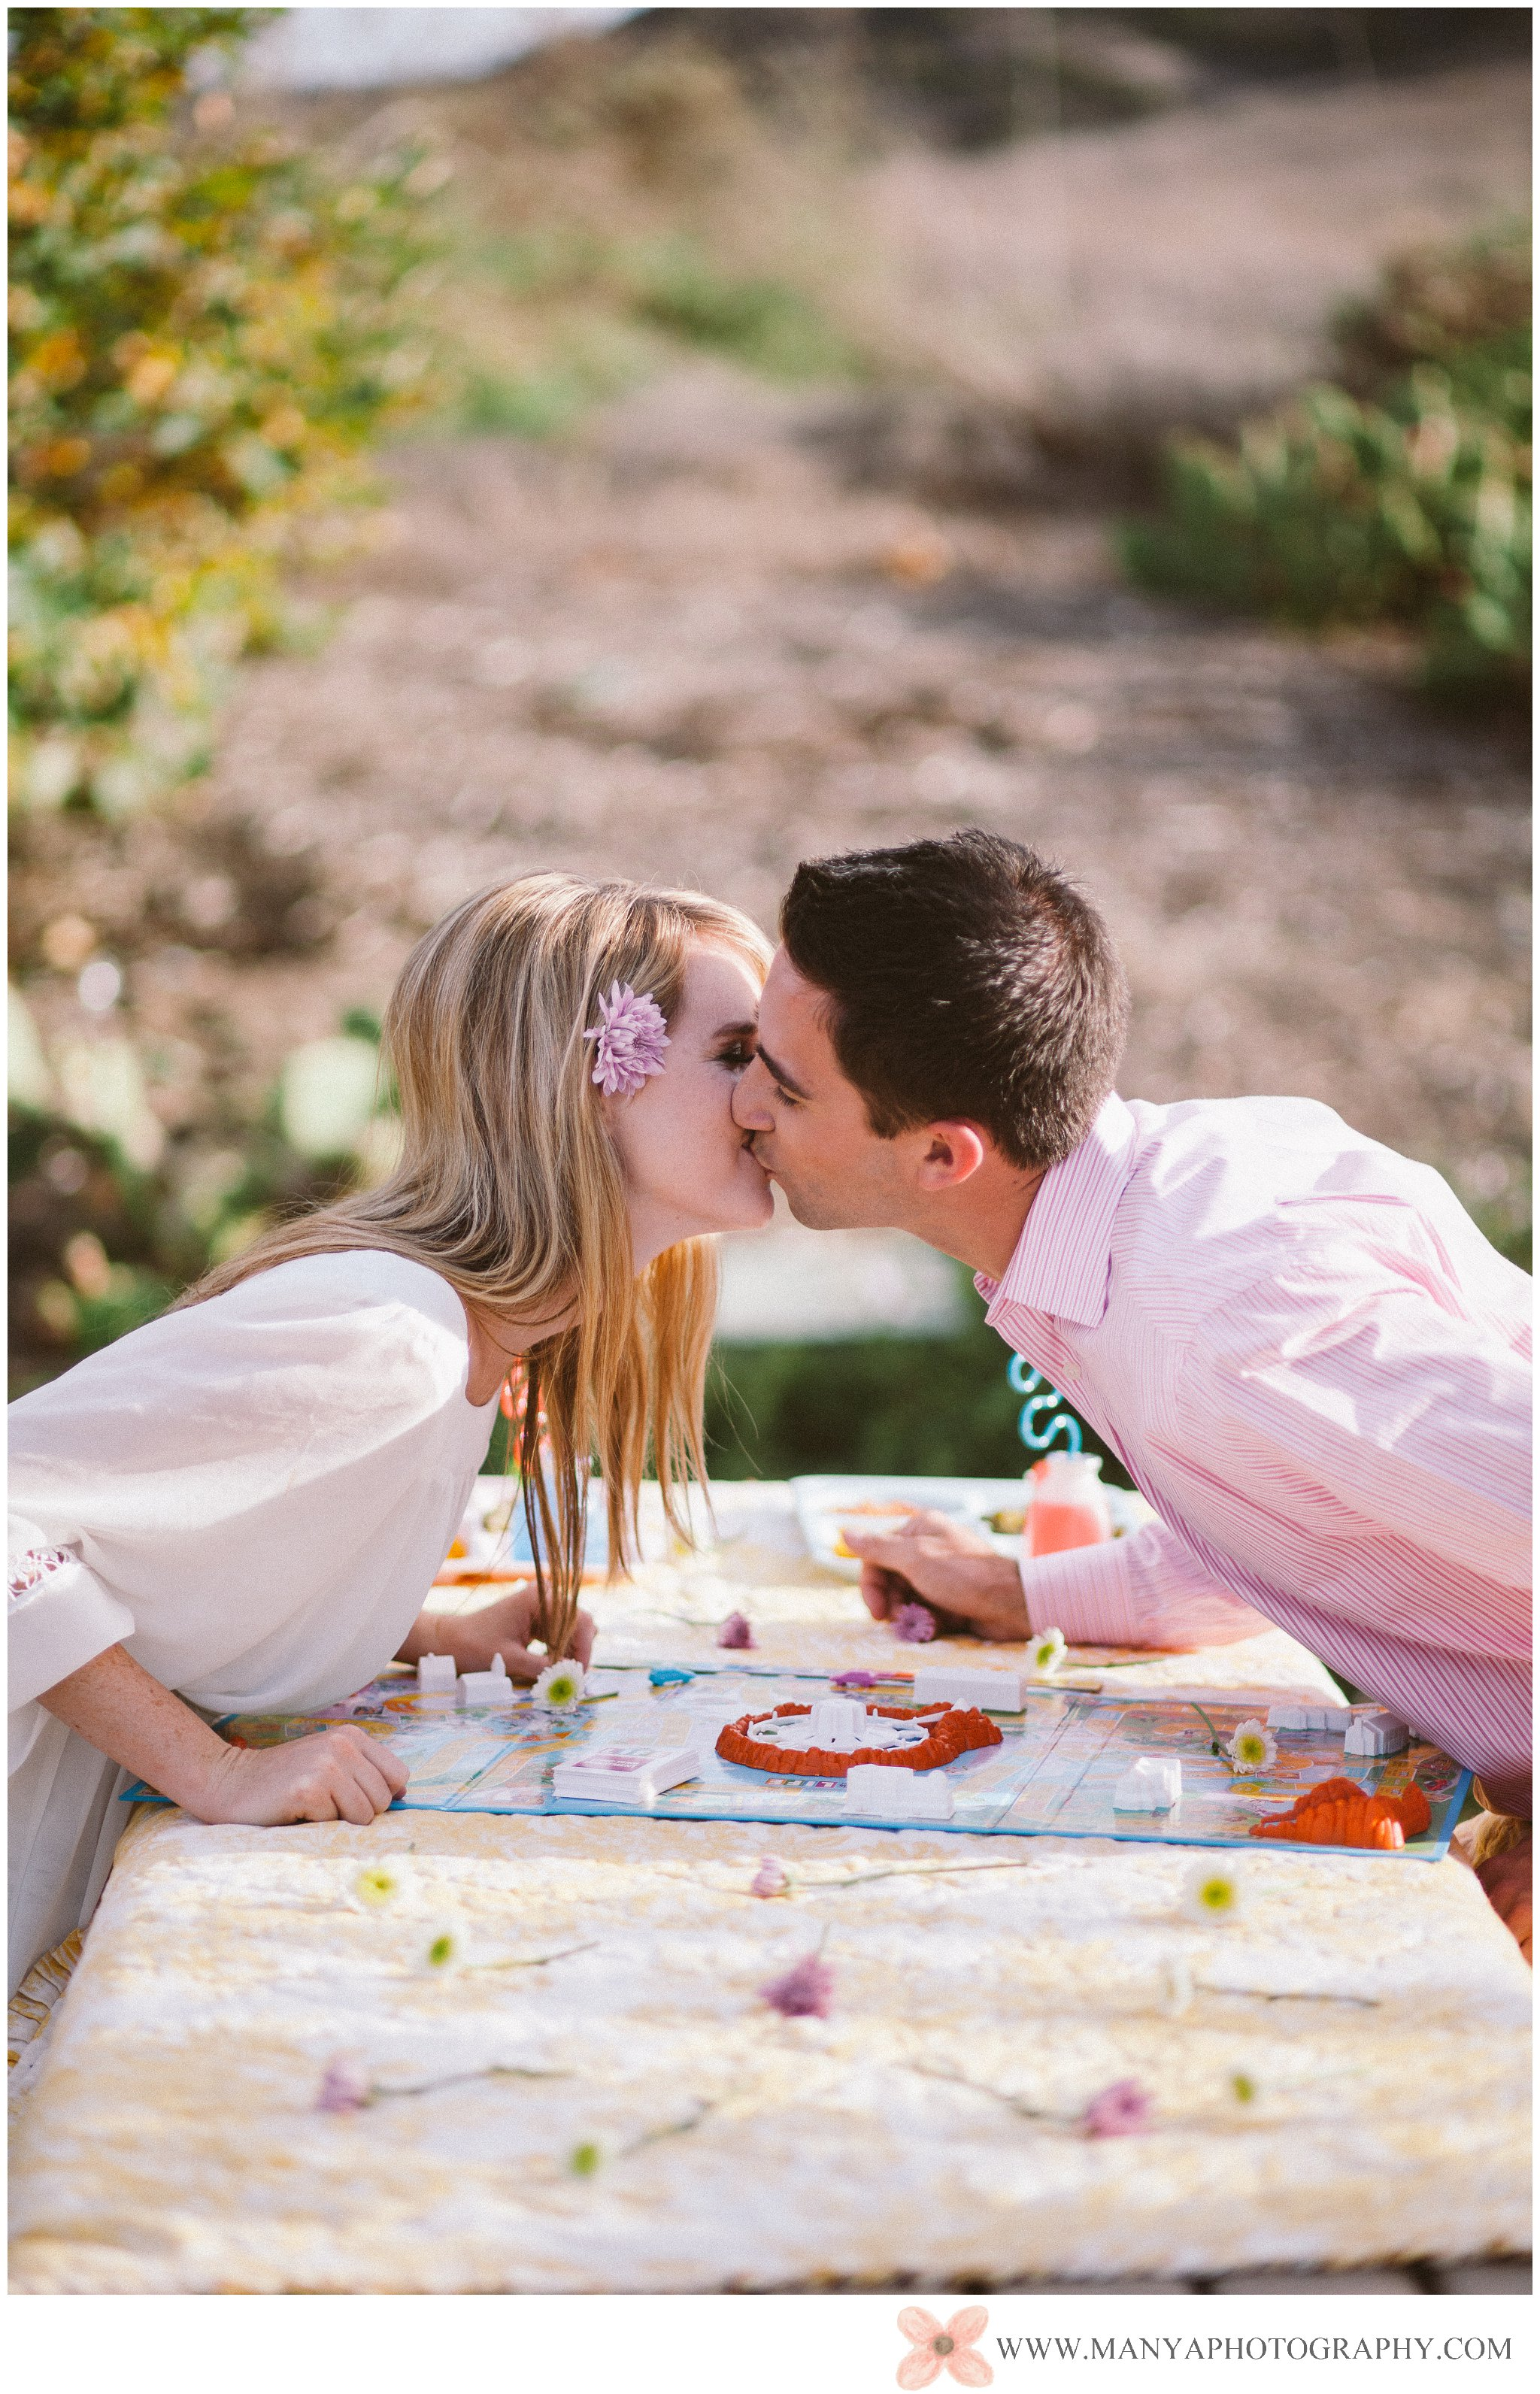 2013-10-17_0019 - Orange County Wedding Photographer